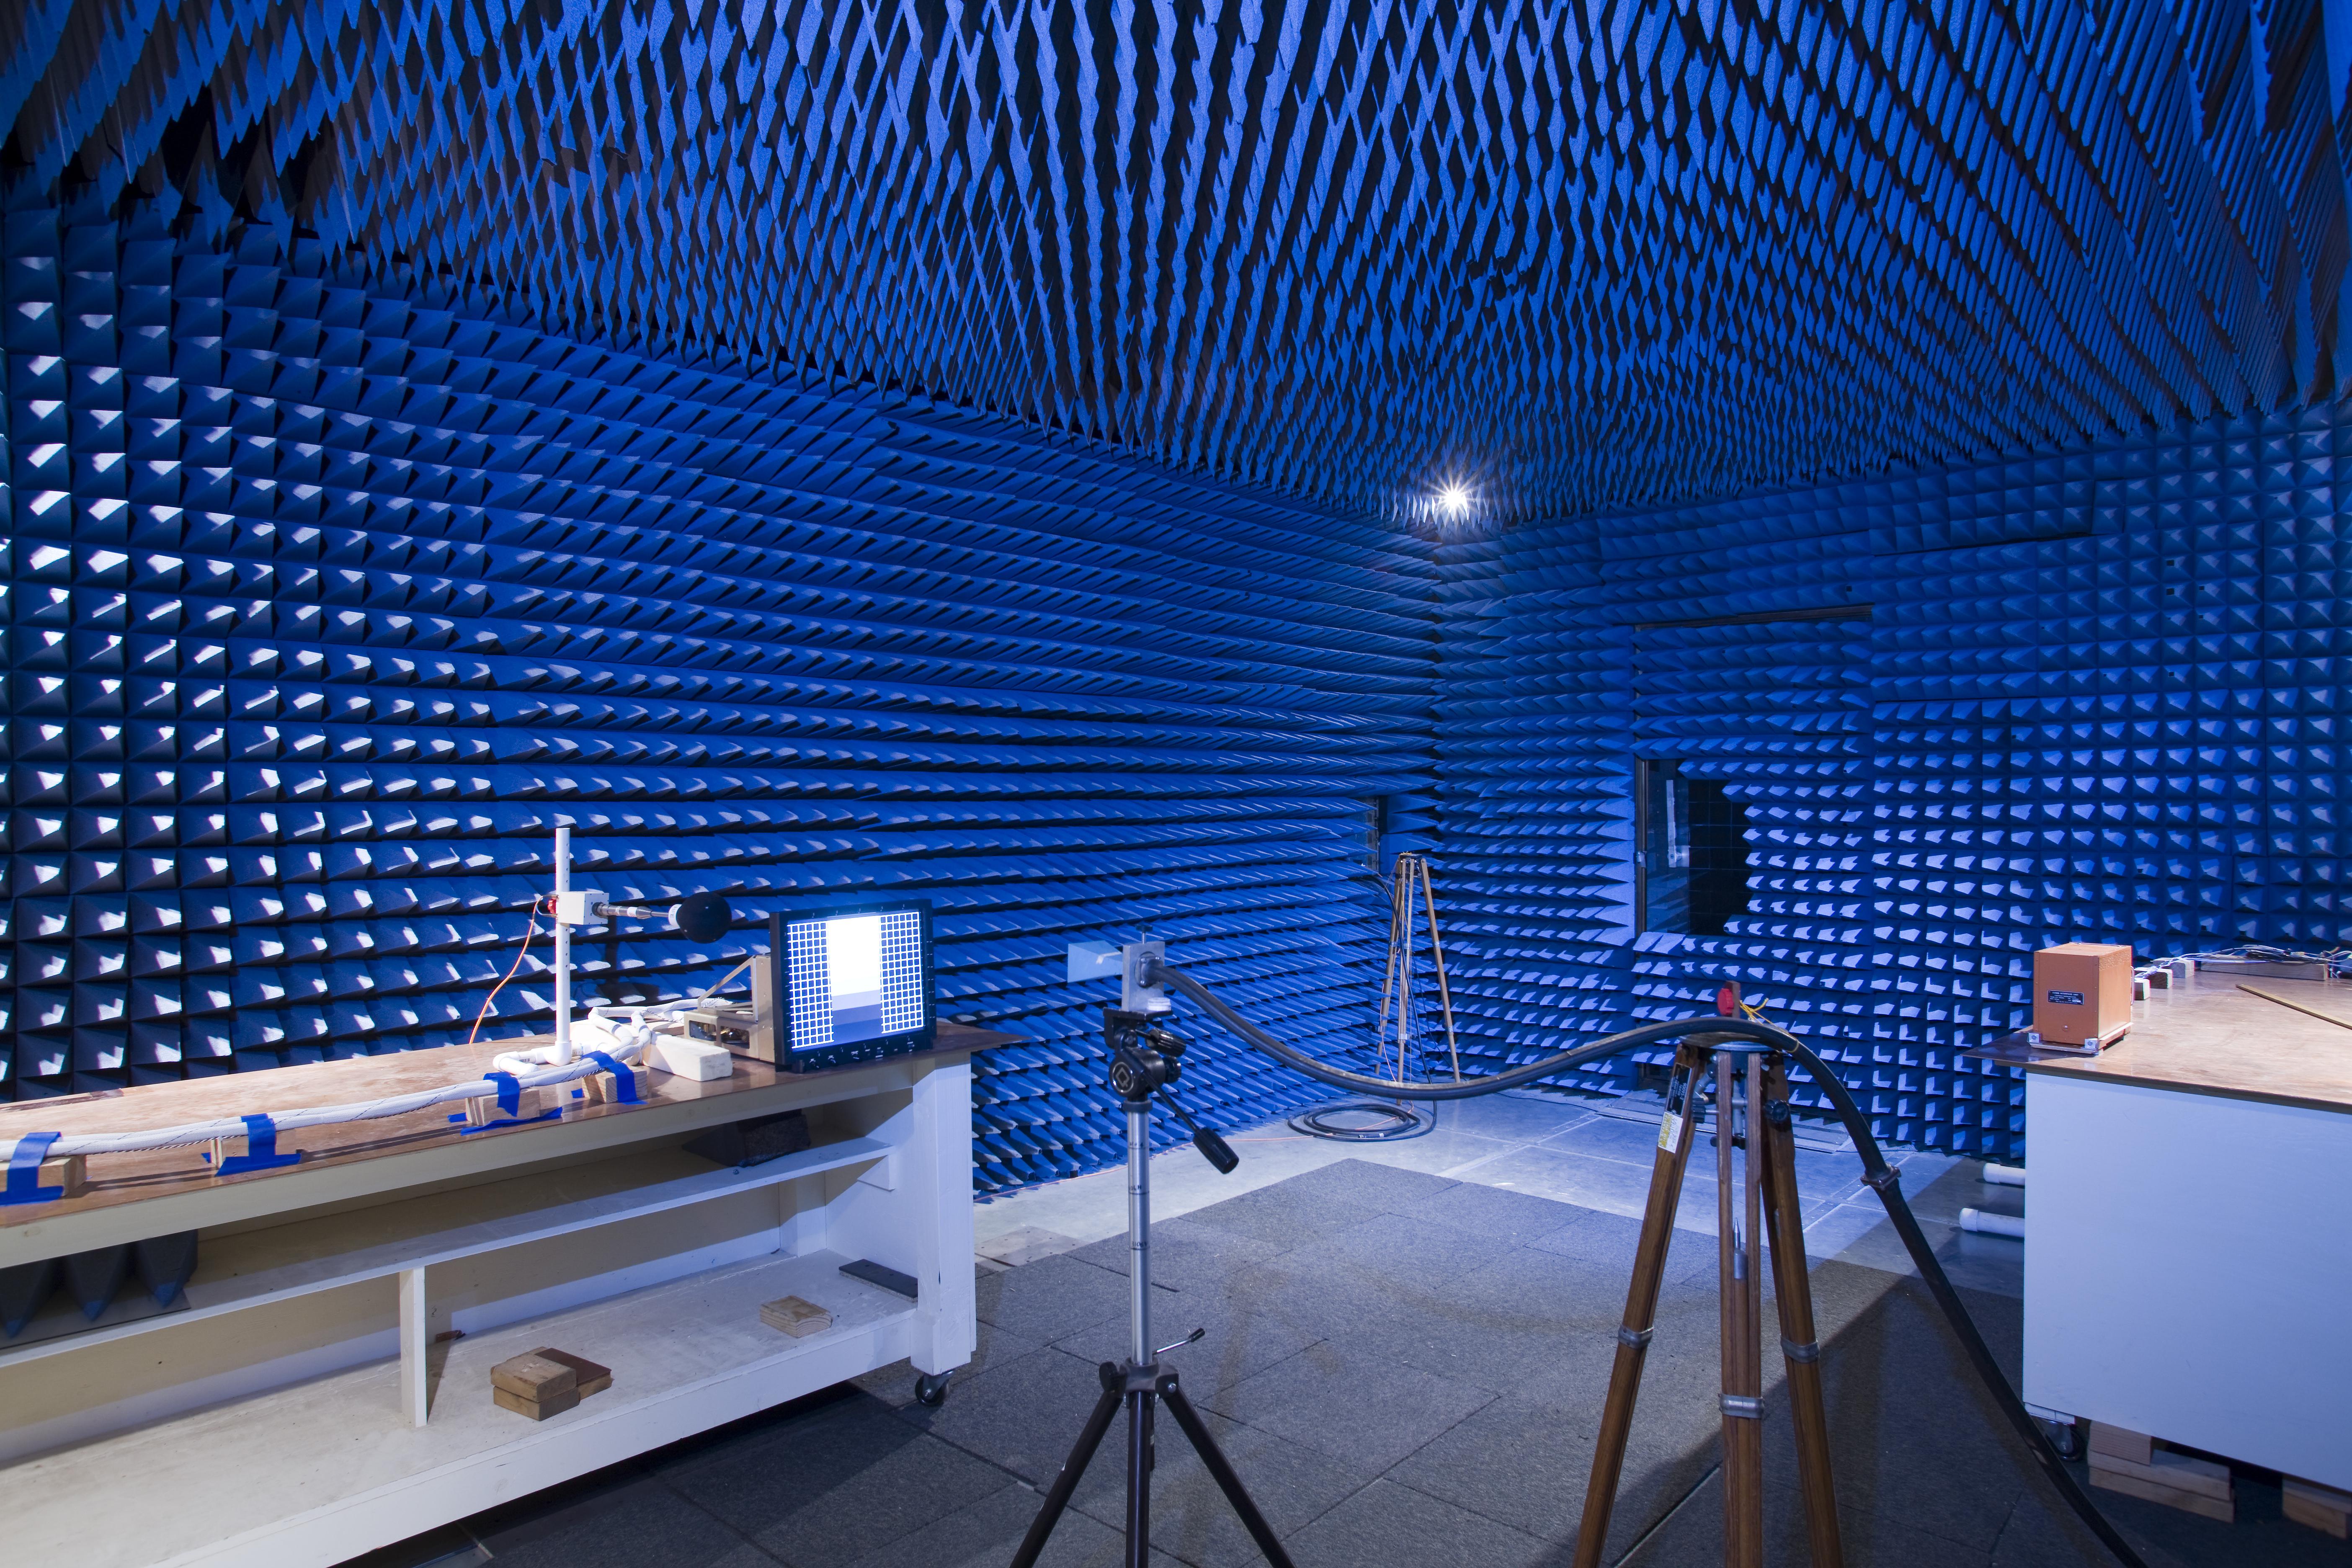 NTS emi/emc testing lab in rustburg